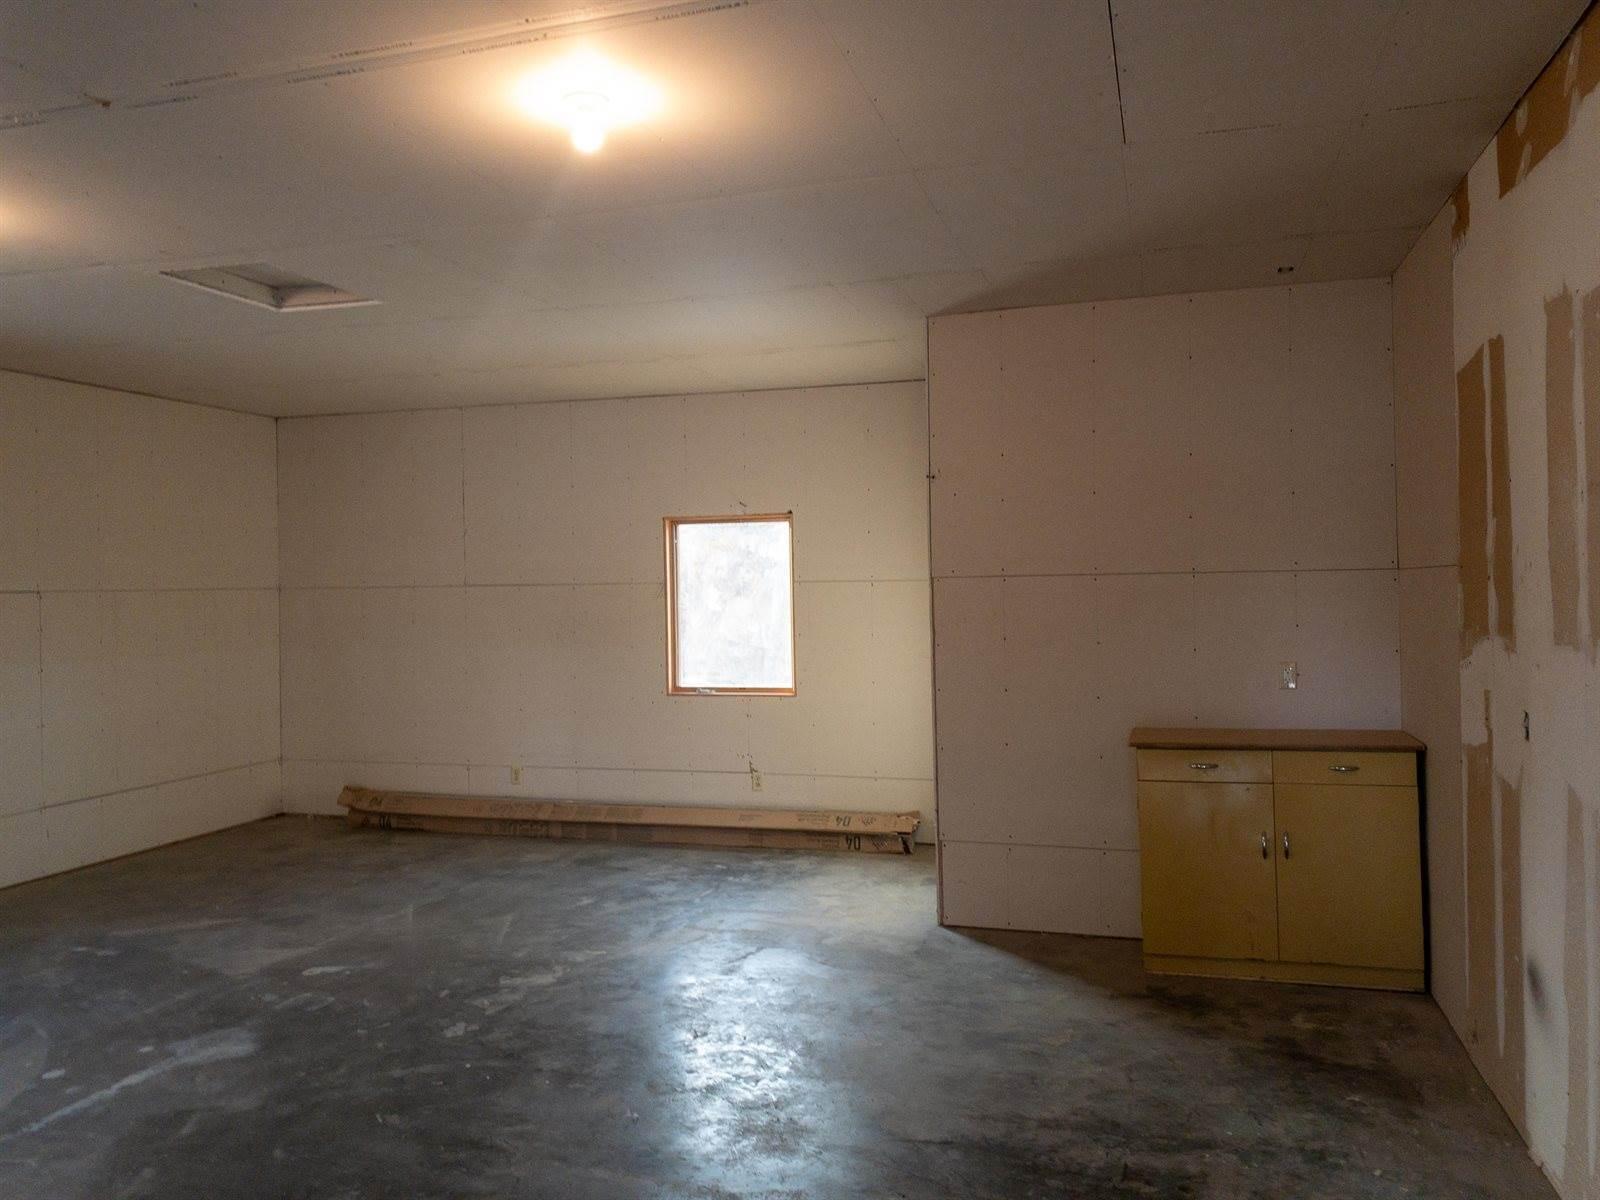 205 Tubman St, Bainville, MT 59212